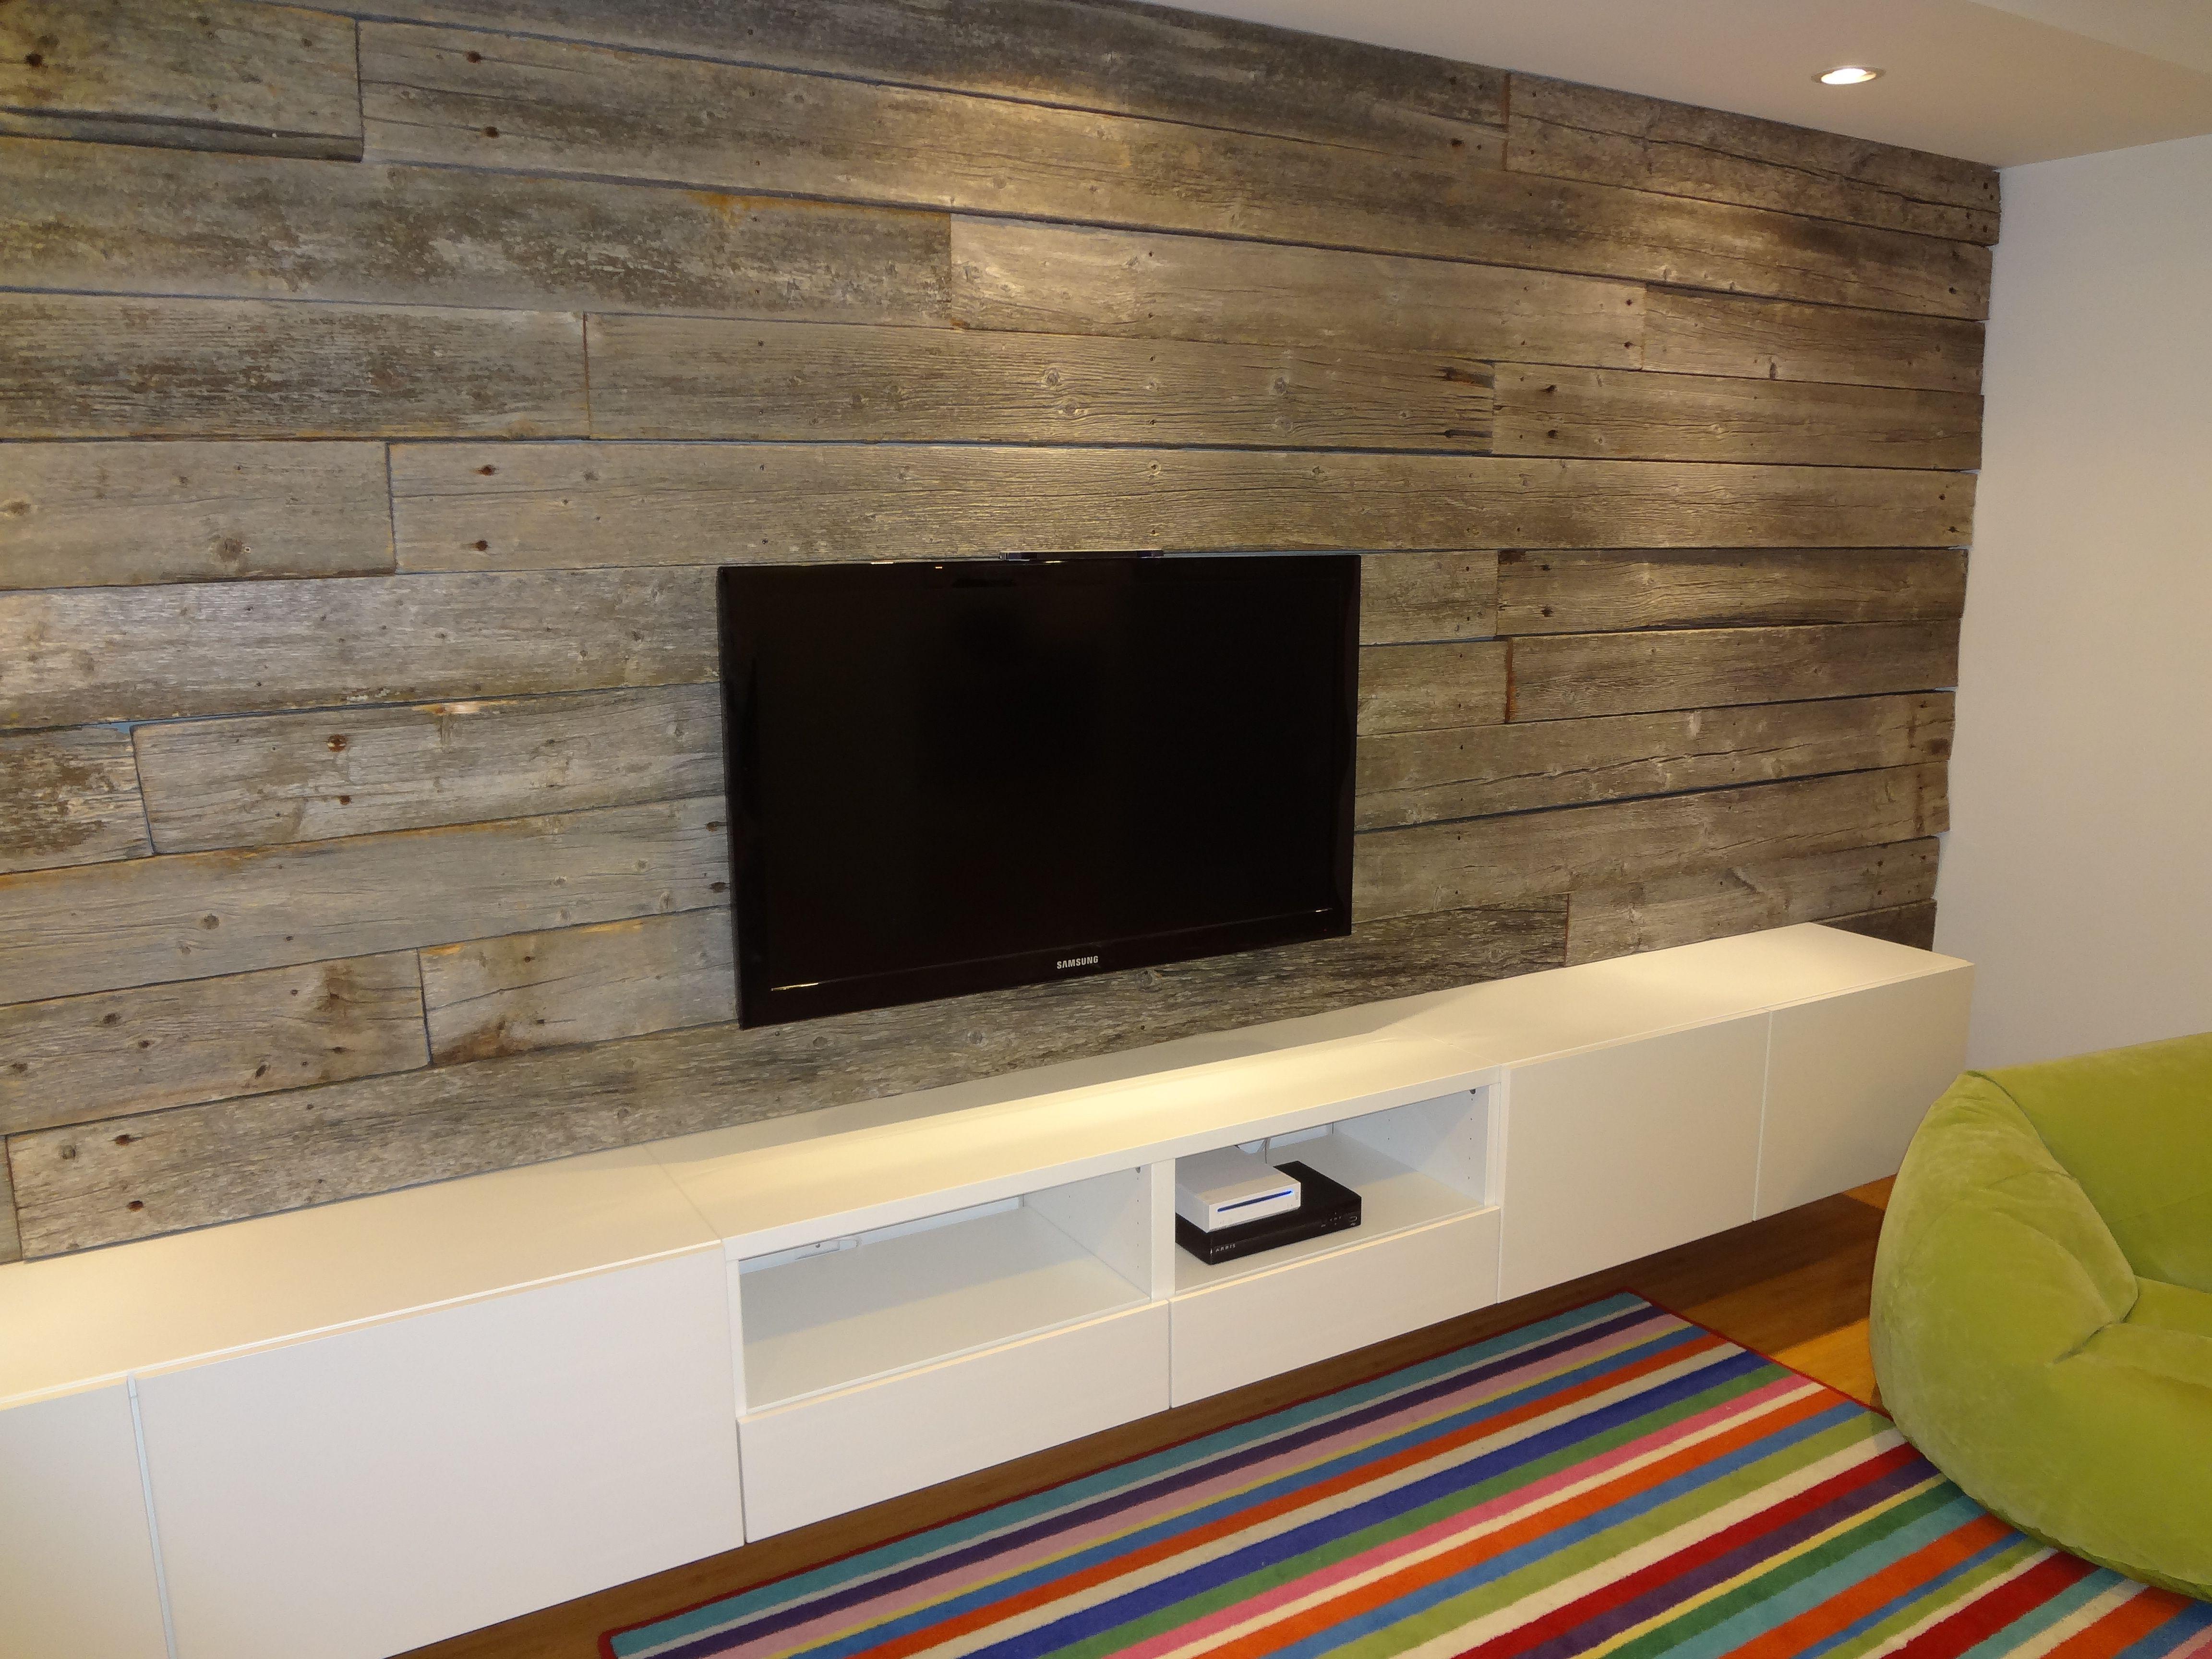 tasty home entertainment center ideas. Modern Family Home  modern basement edmonton Flawless Interiors Barn board Basement Wall TV too small reclaimed wood wall